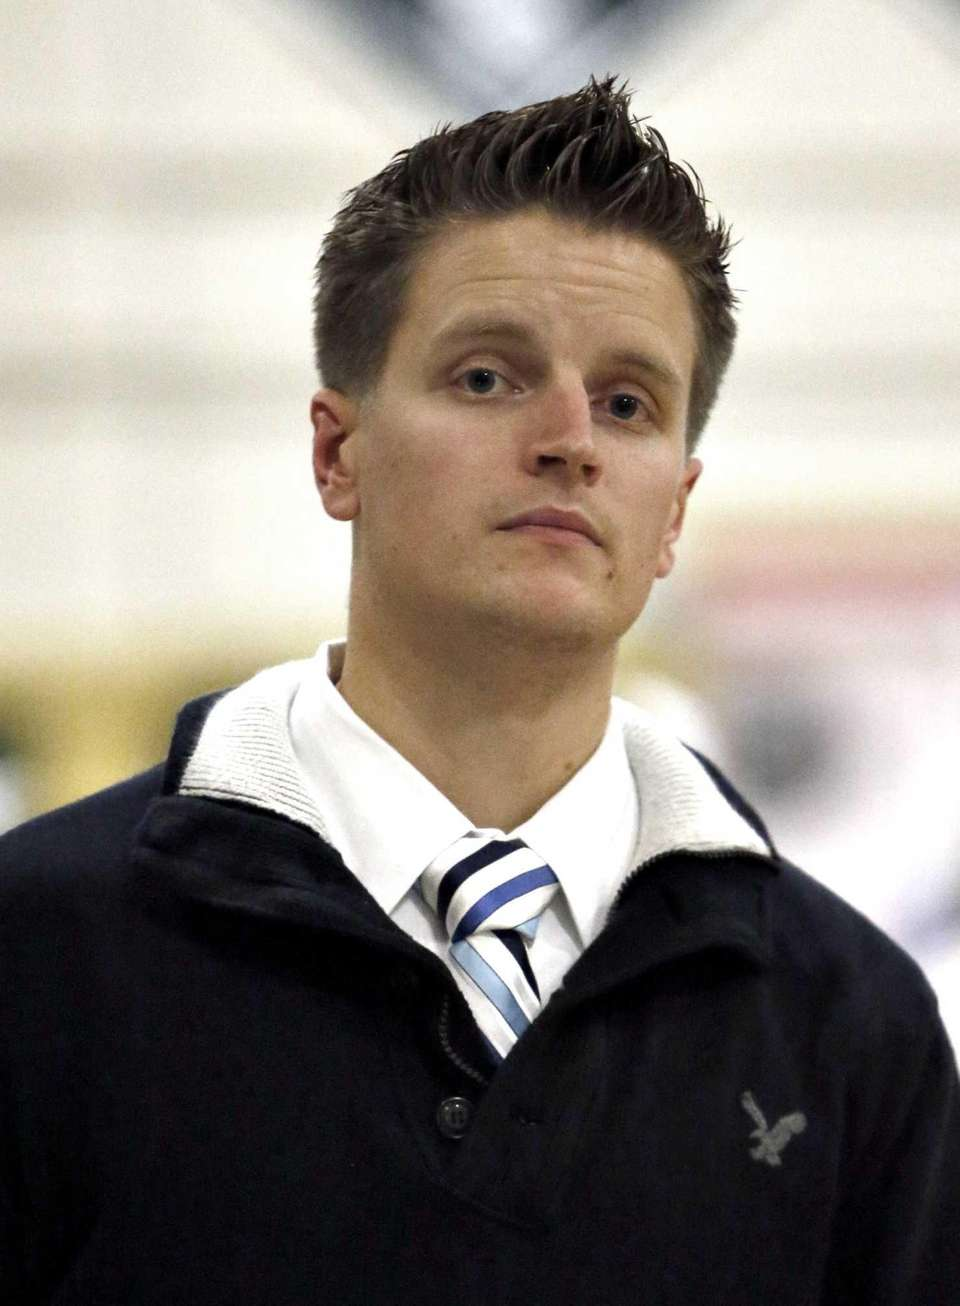 Lindenhurst boys varsity basketball head coach Brett Kearney